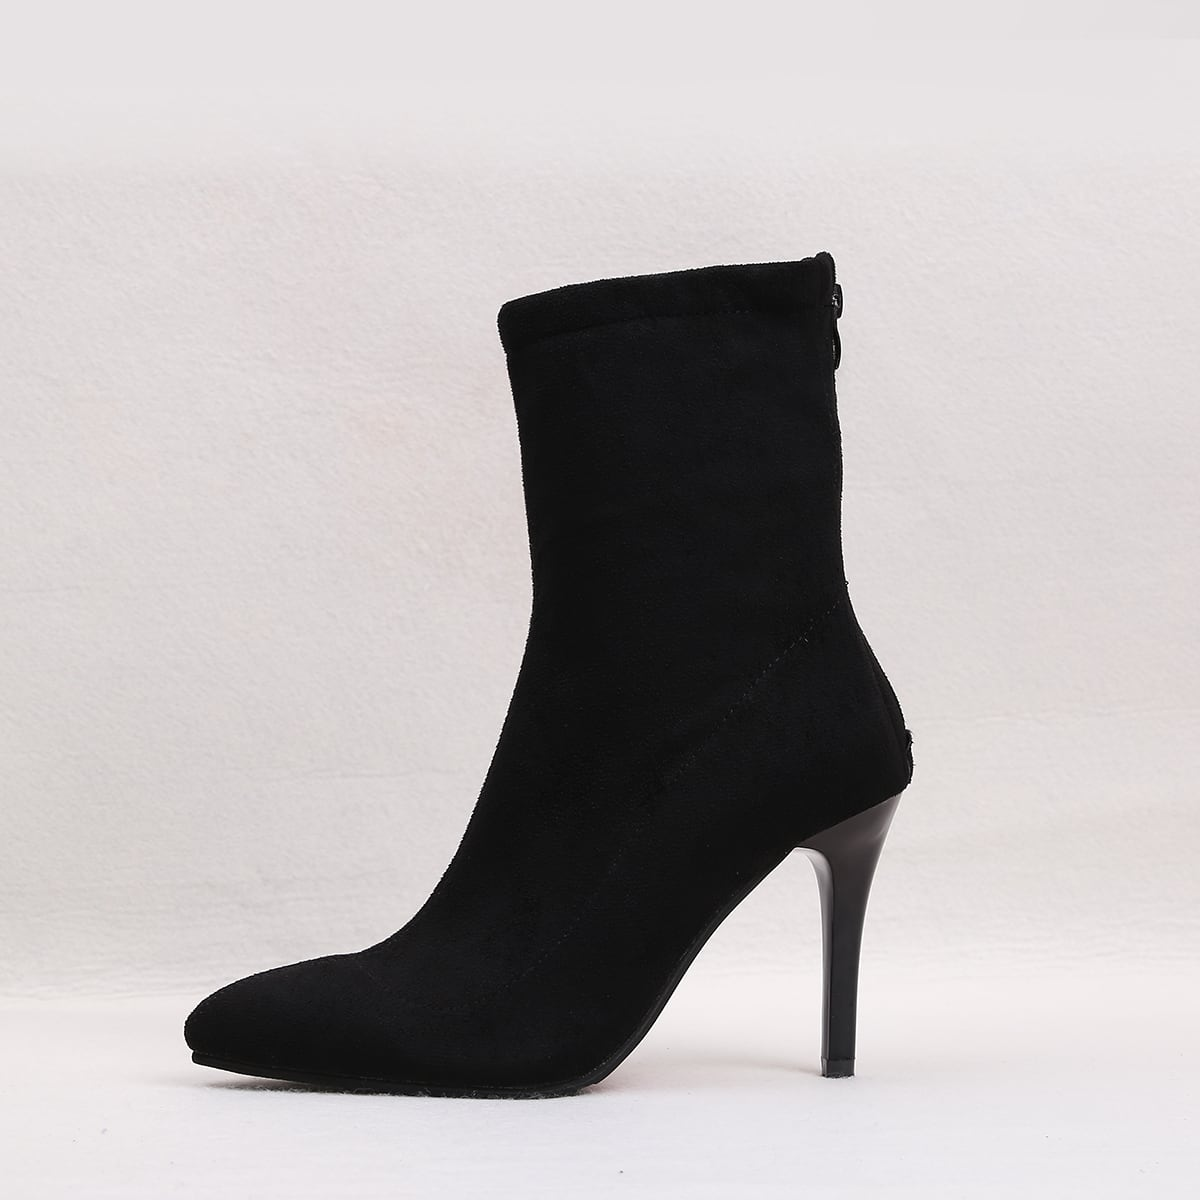 Замшевые сапоги на каблуках от SHEIN